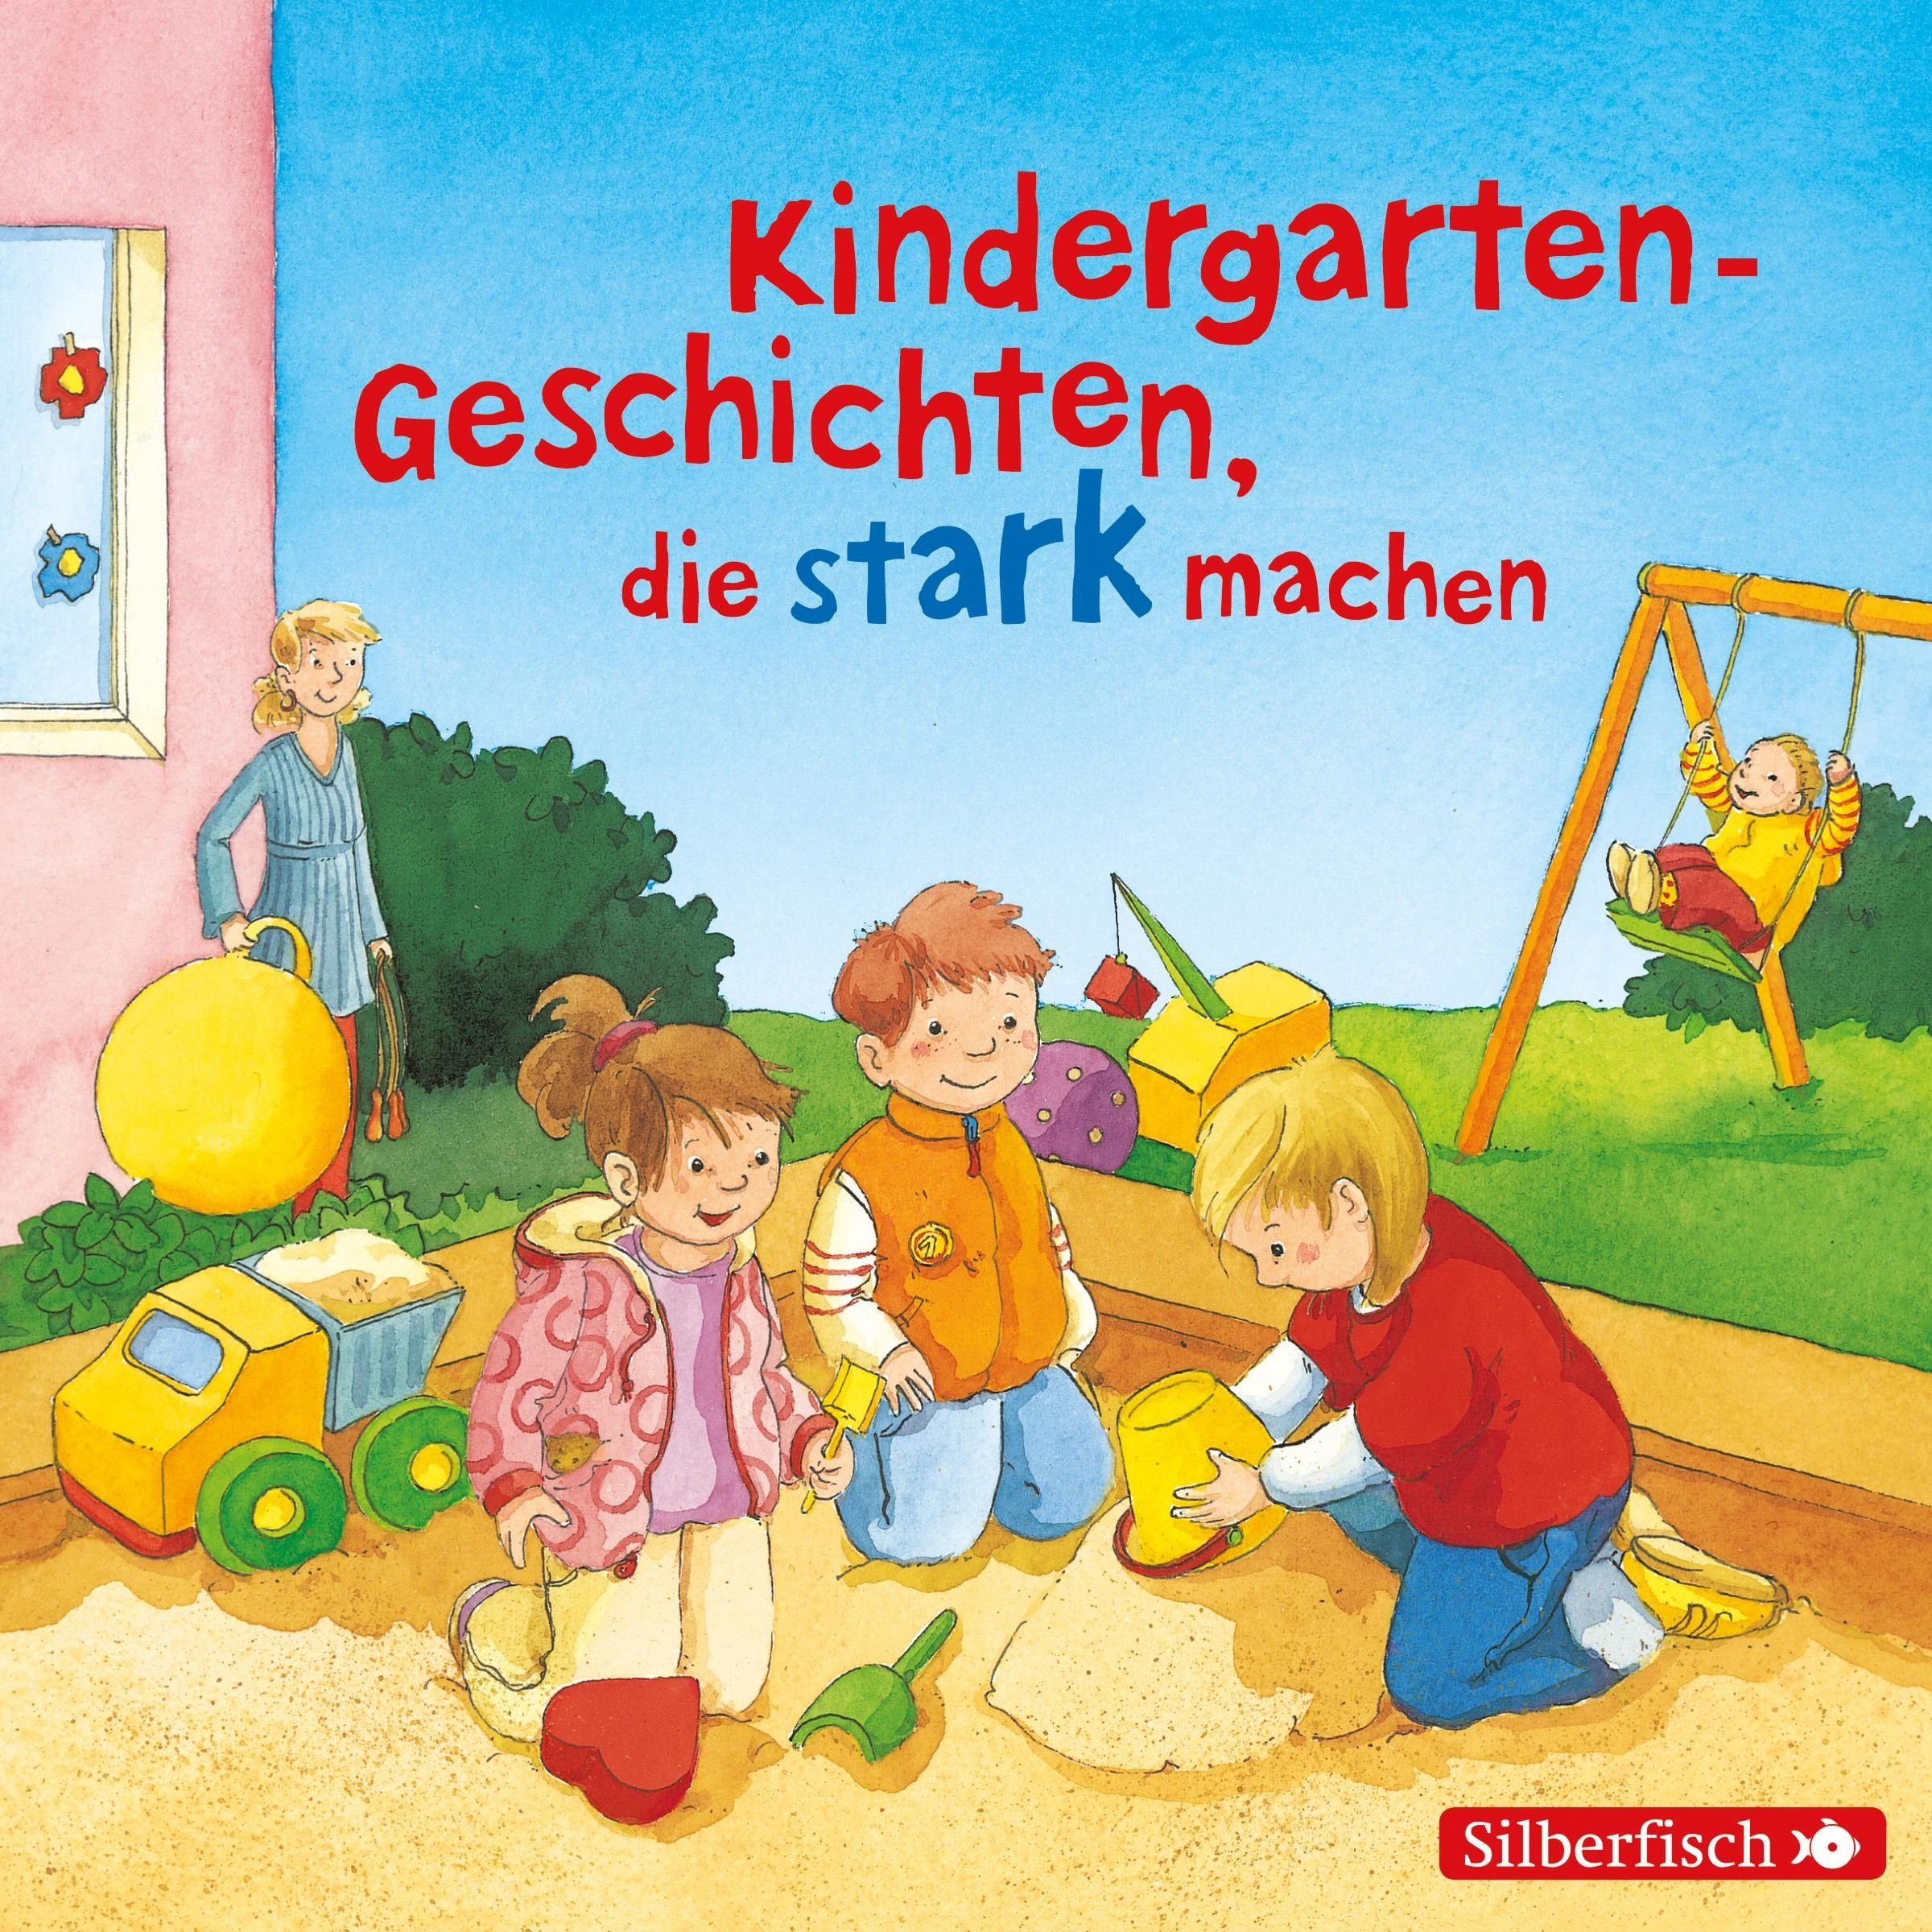 Kindergarten-Geschichten, die stark machen: 1 CD